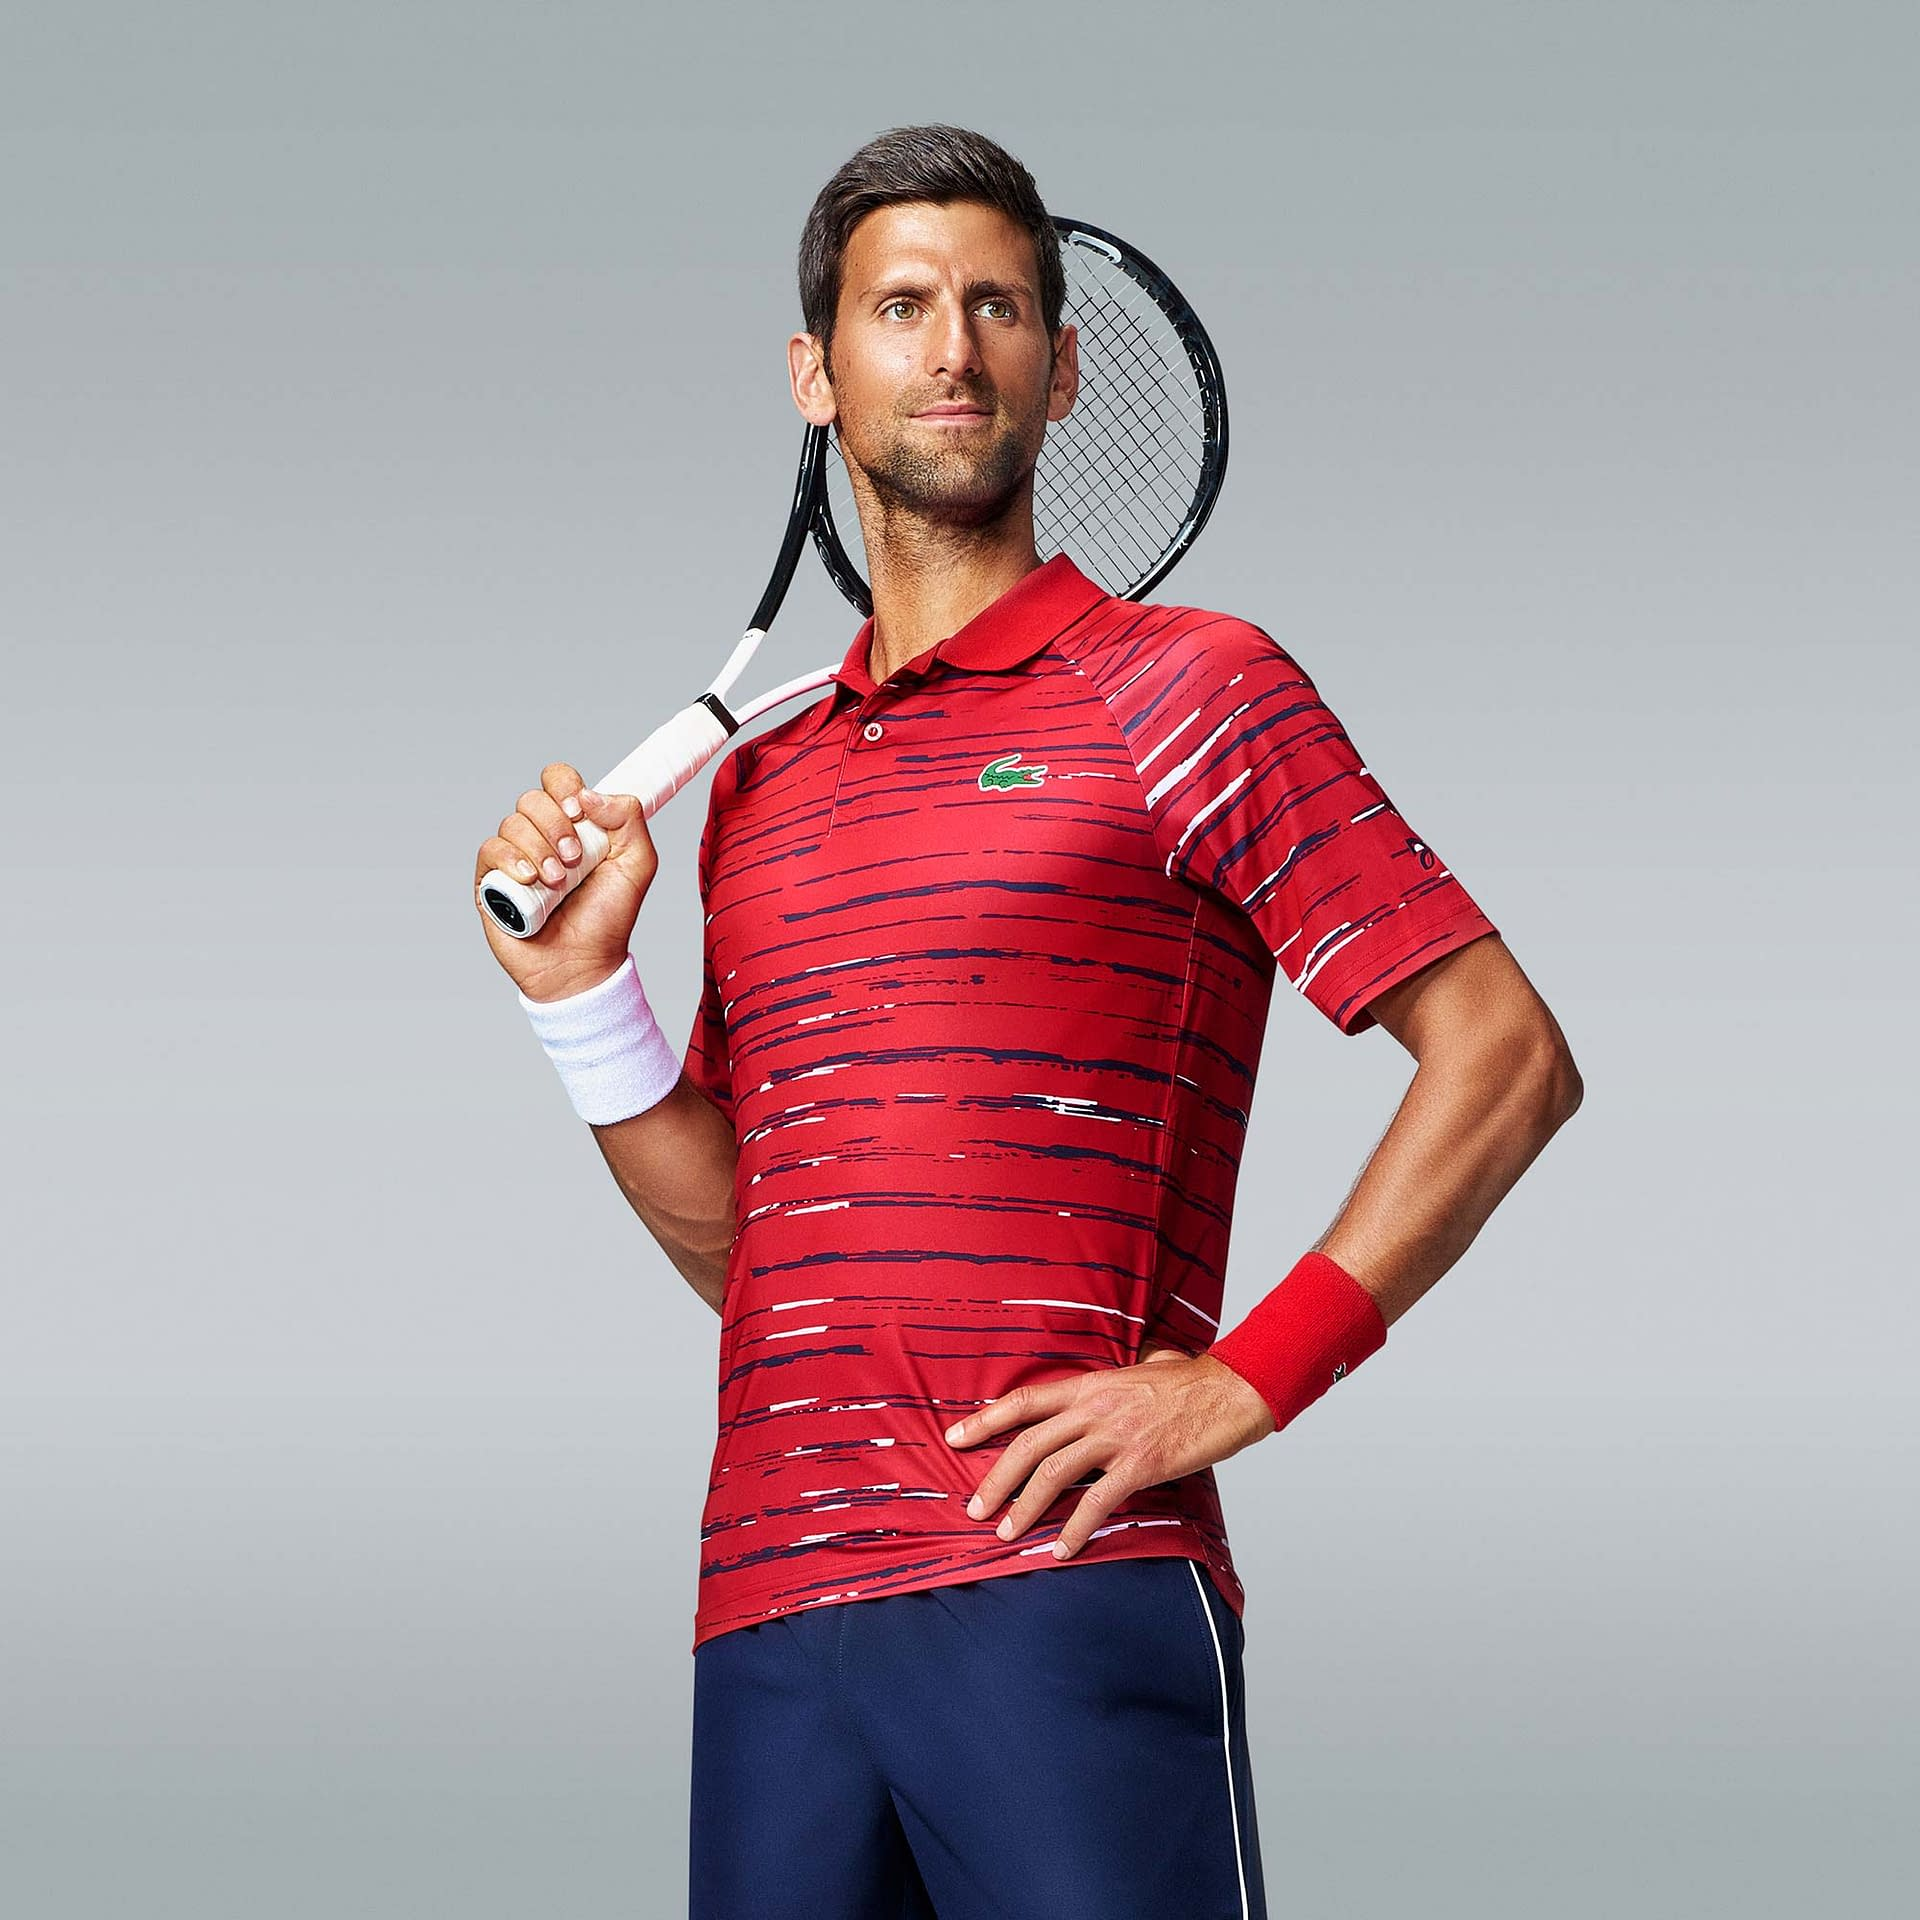 portrait photos of tennis super star novak djokovic in studio using profoto lighting on grey back drop